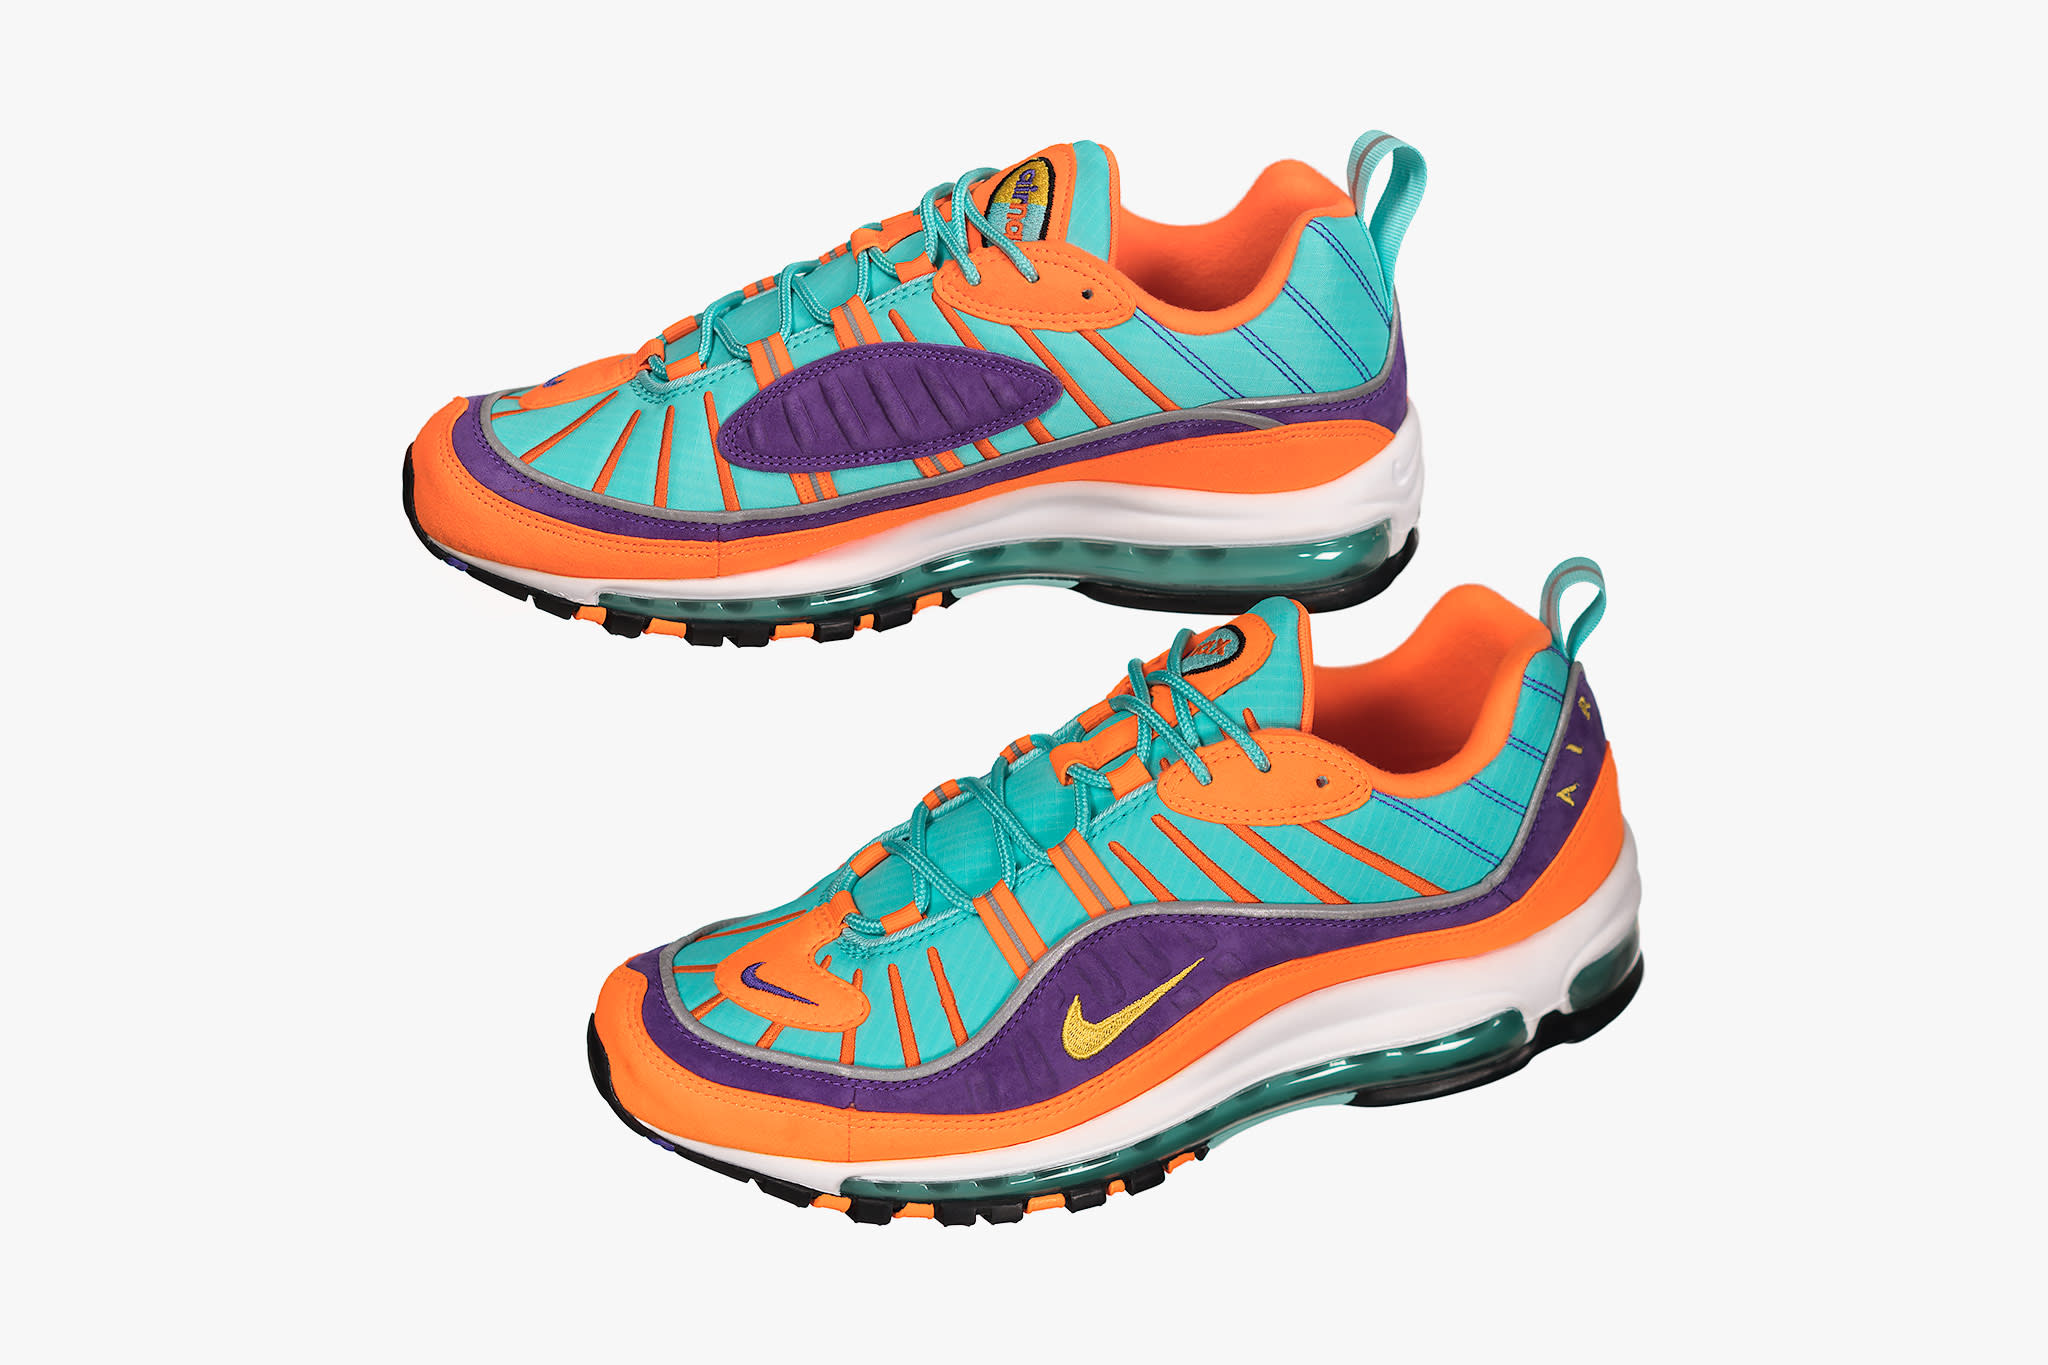 719c8b3c85631 SOLD OUT  Nike Air Max 98 QS